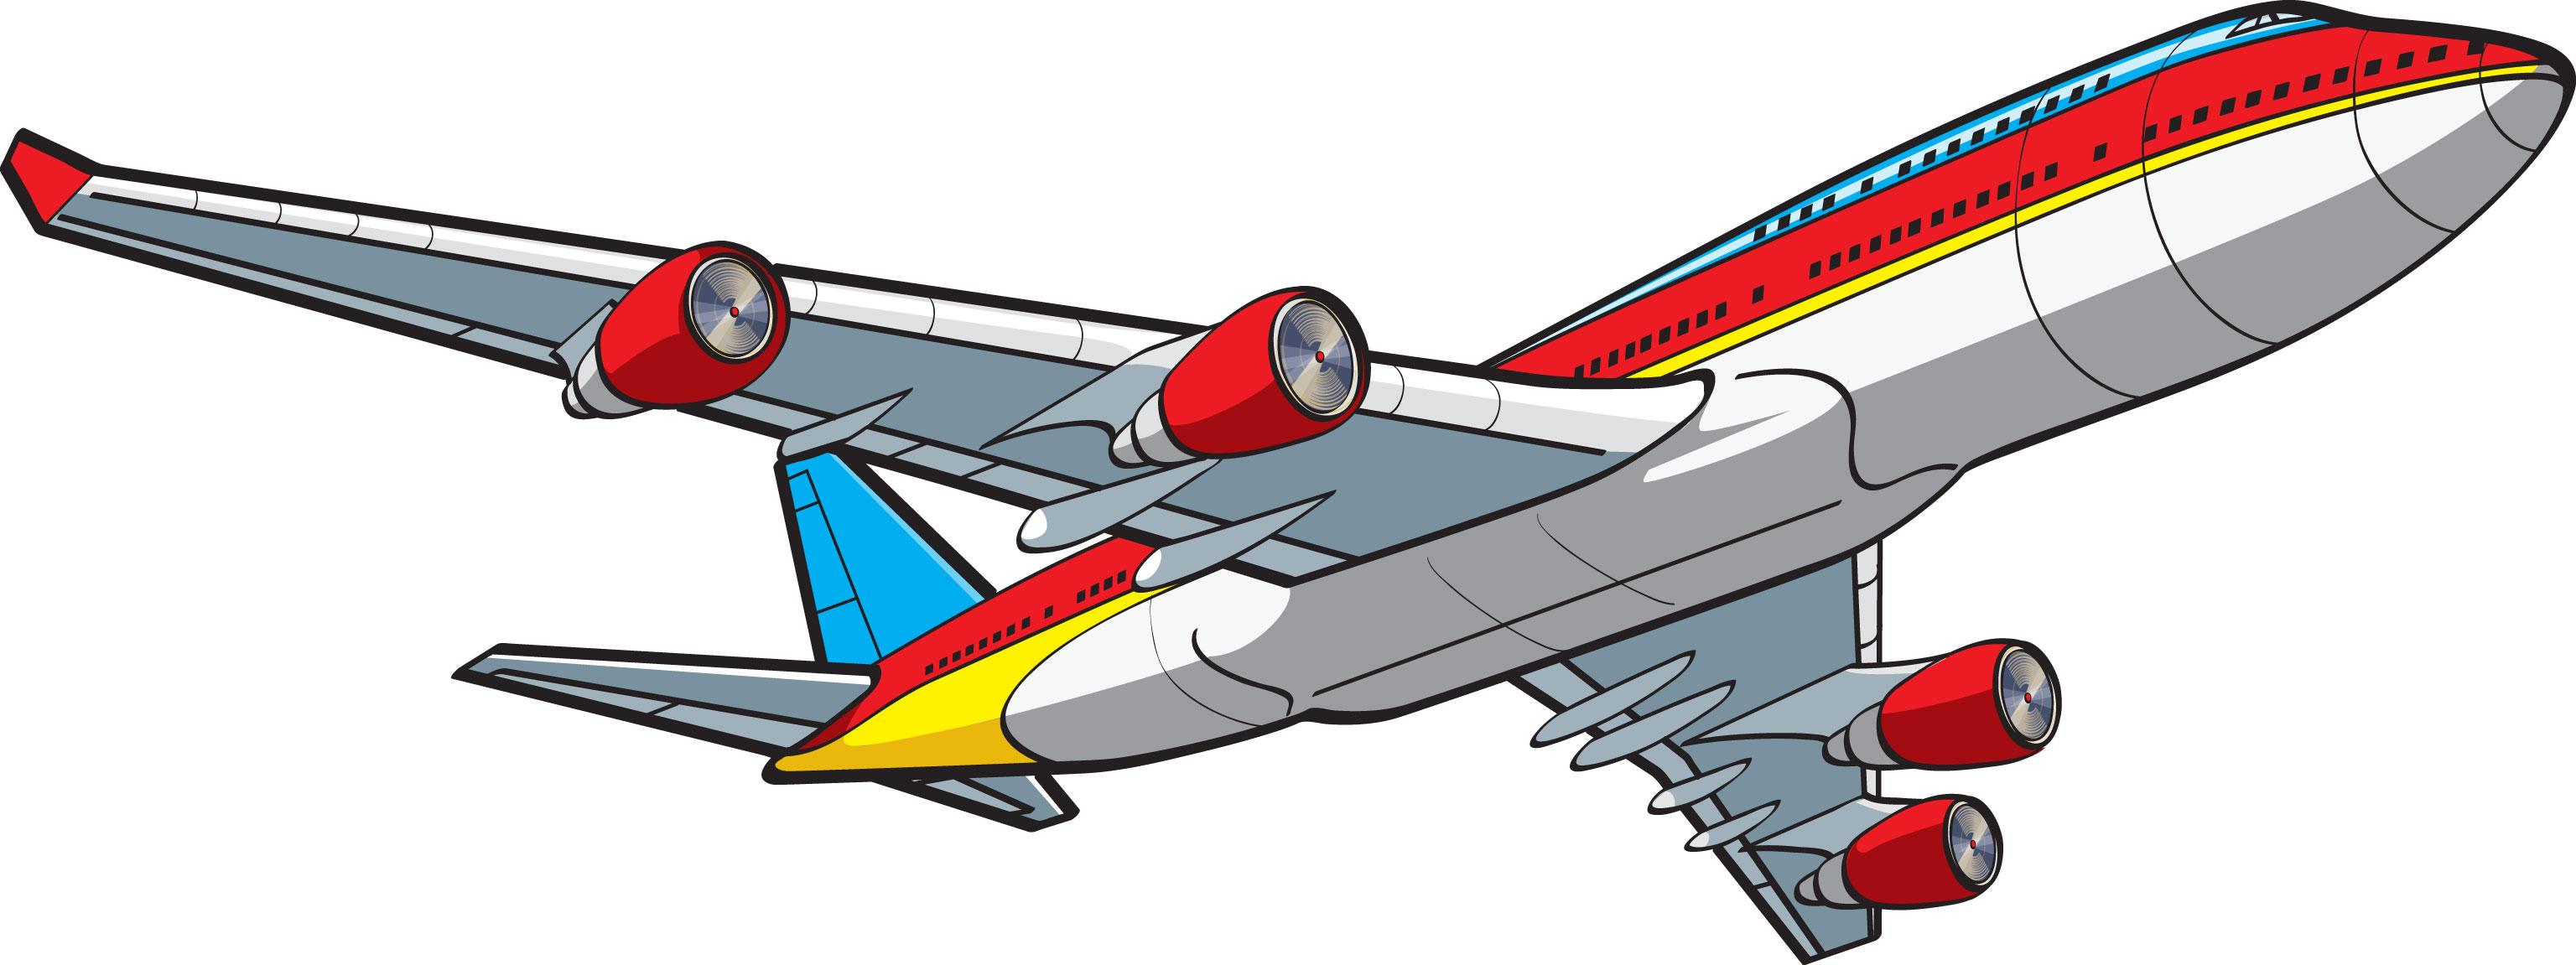 Clip Art Plane Clipart jet plane clipart kid cartoon airplane panda free images